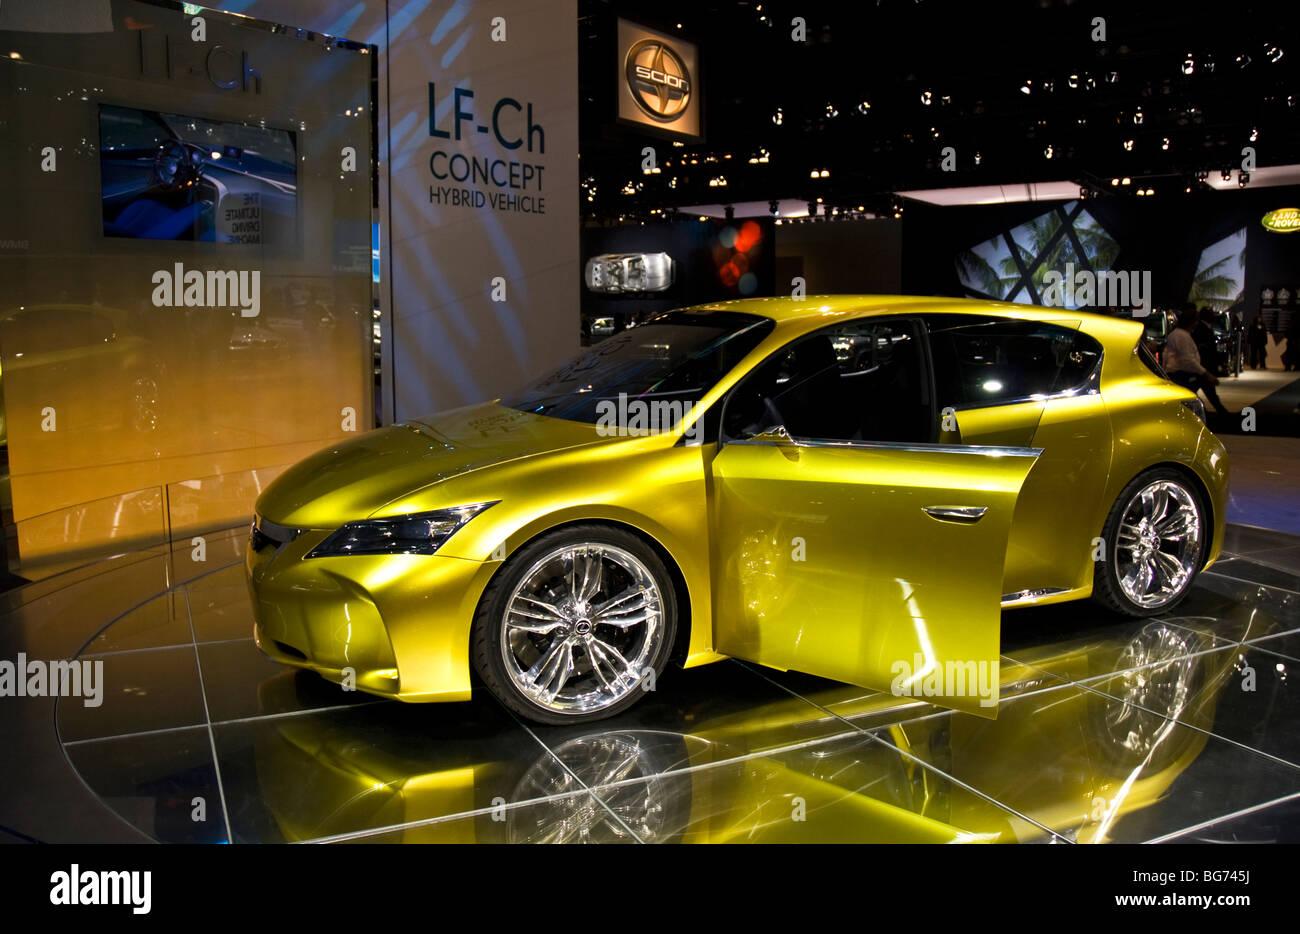 http://c8.alamy.com/comp/BG745J/the-lexus-lf-ch-concept-na-debut-at-the-2009-la-auto-show-in-the-los-BG745J.jpg